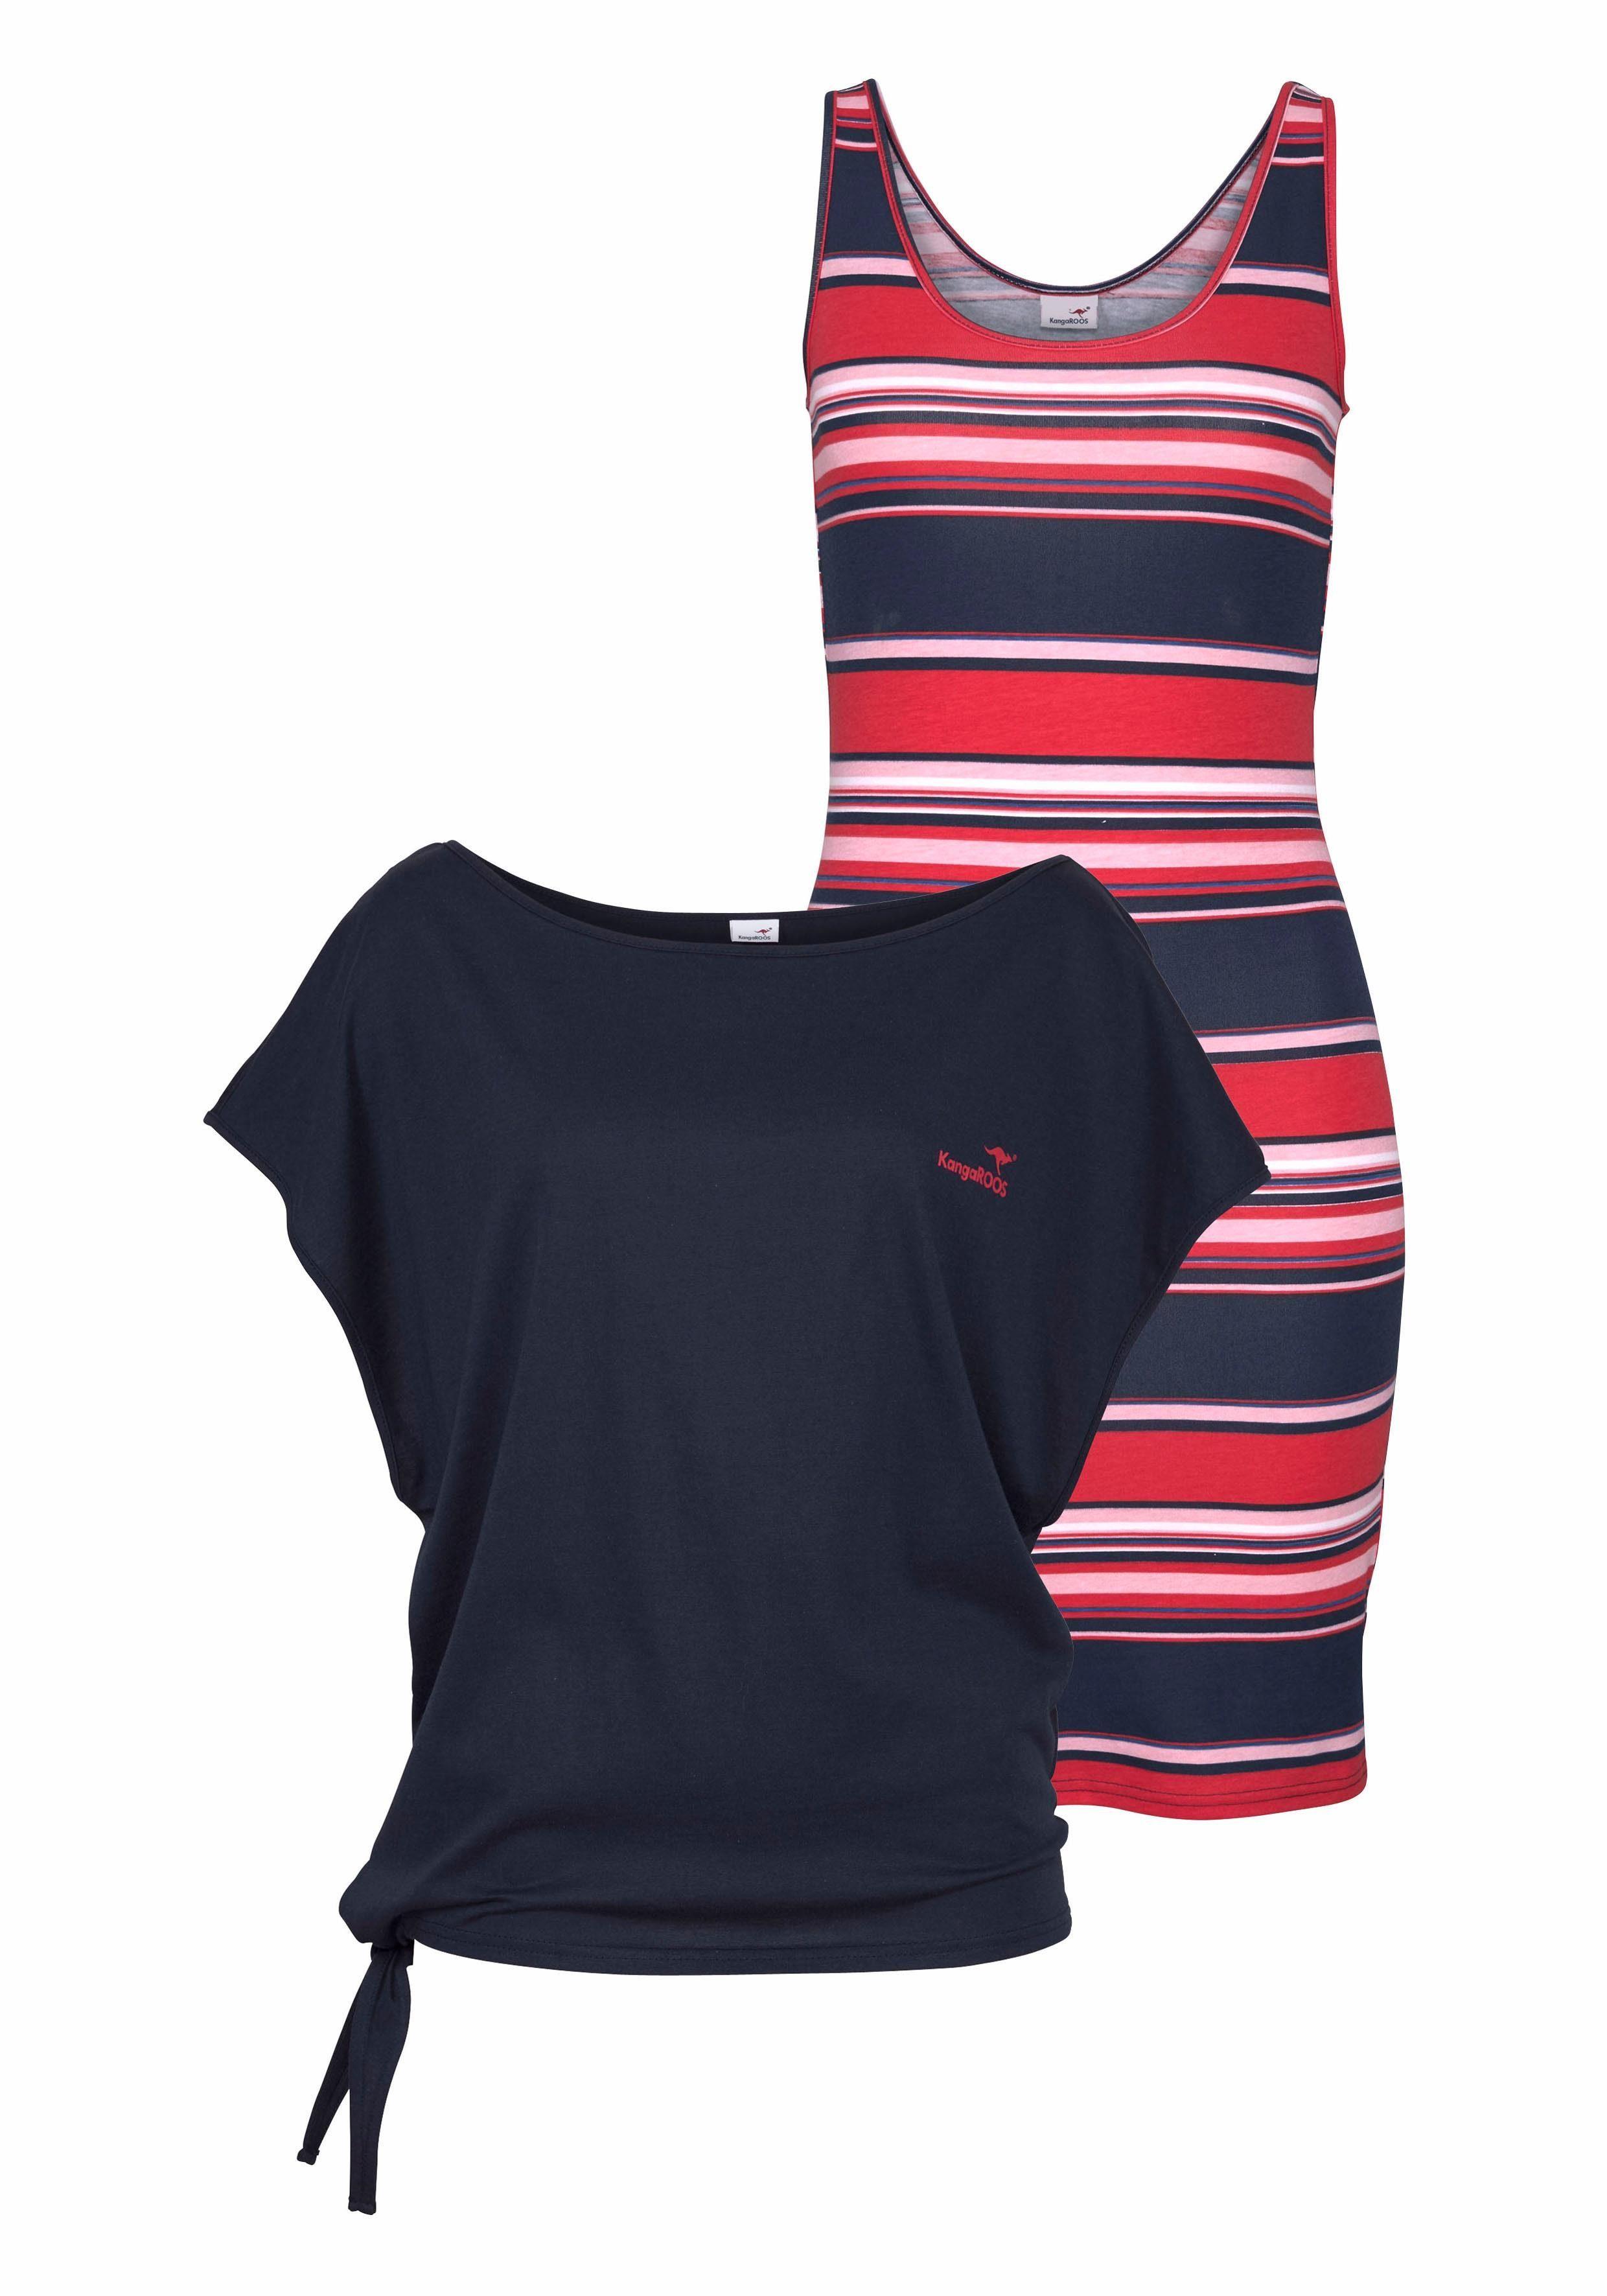 Kaufen Kangaroos T shirtStretchanteil tlgMit Jerseykleidset2 Online ZuOkXPwiT